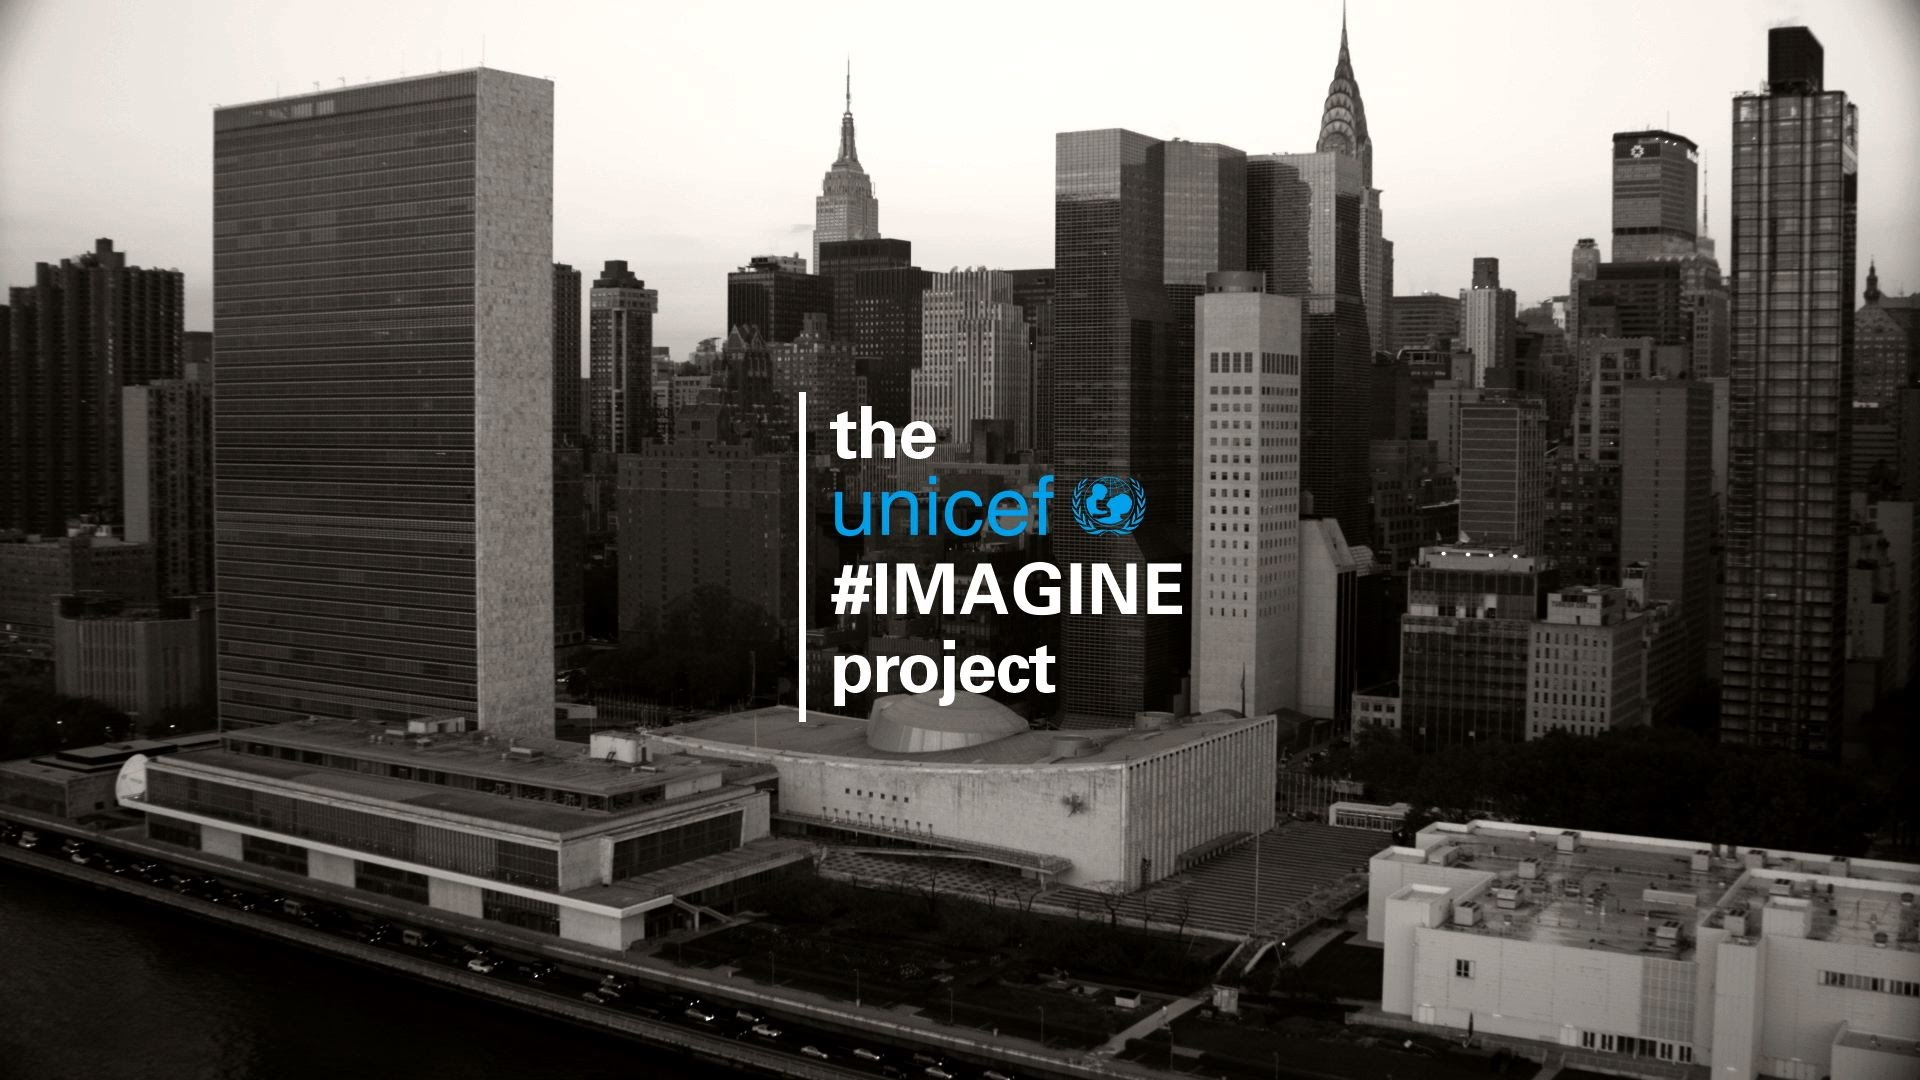 「跟著聯合國兒童基金會,用歌聲許孩子們一個美好未來」- UNICEF: Imagine a Better Future for All Children